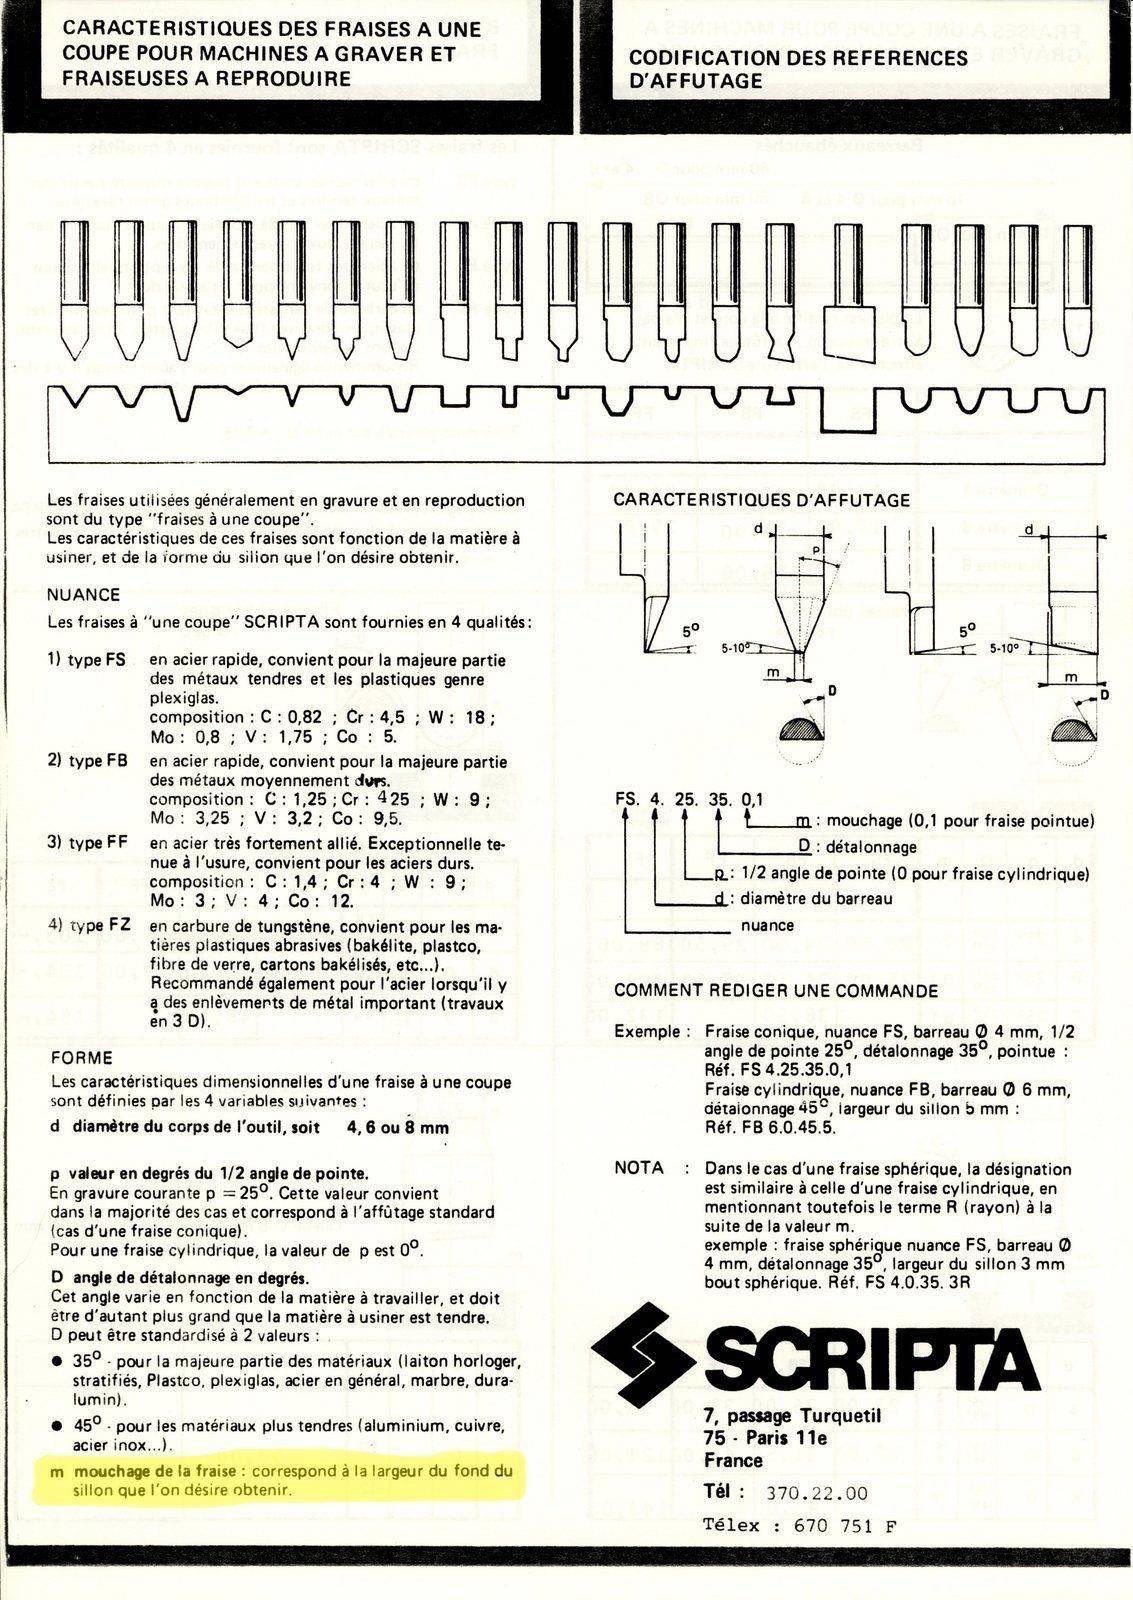 scripta7 [].jpg